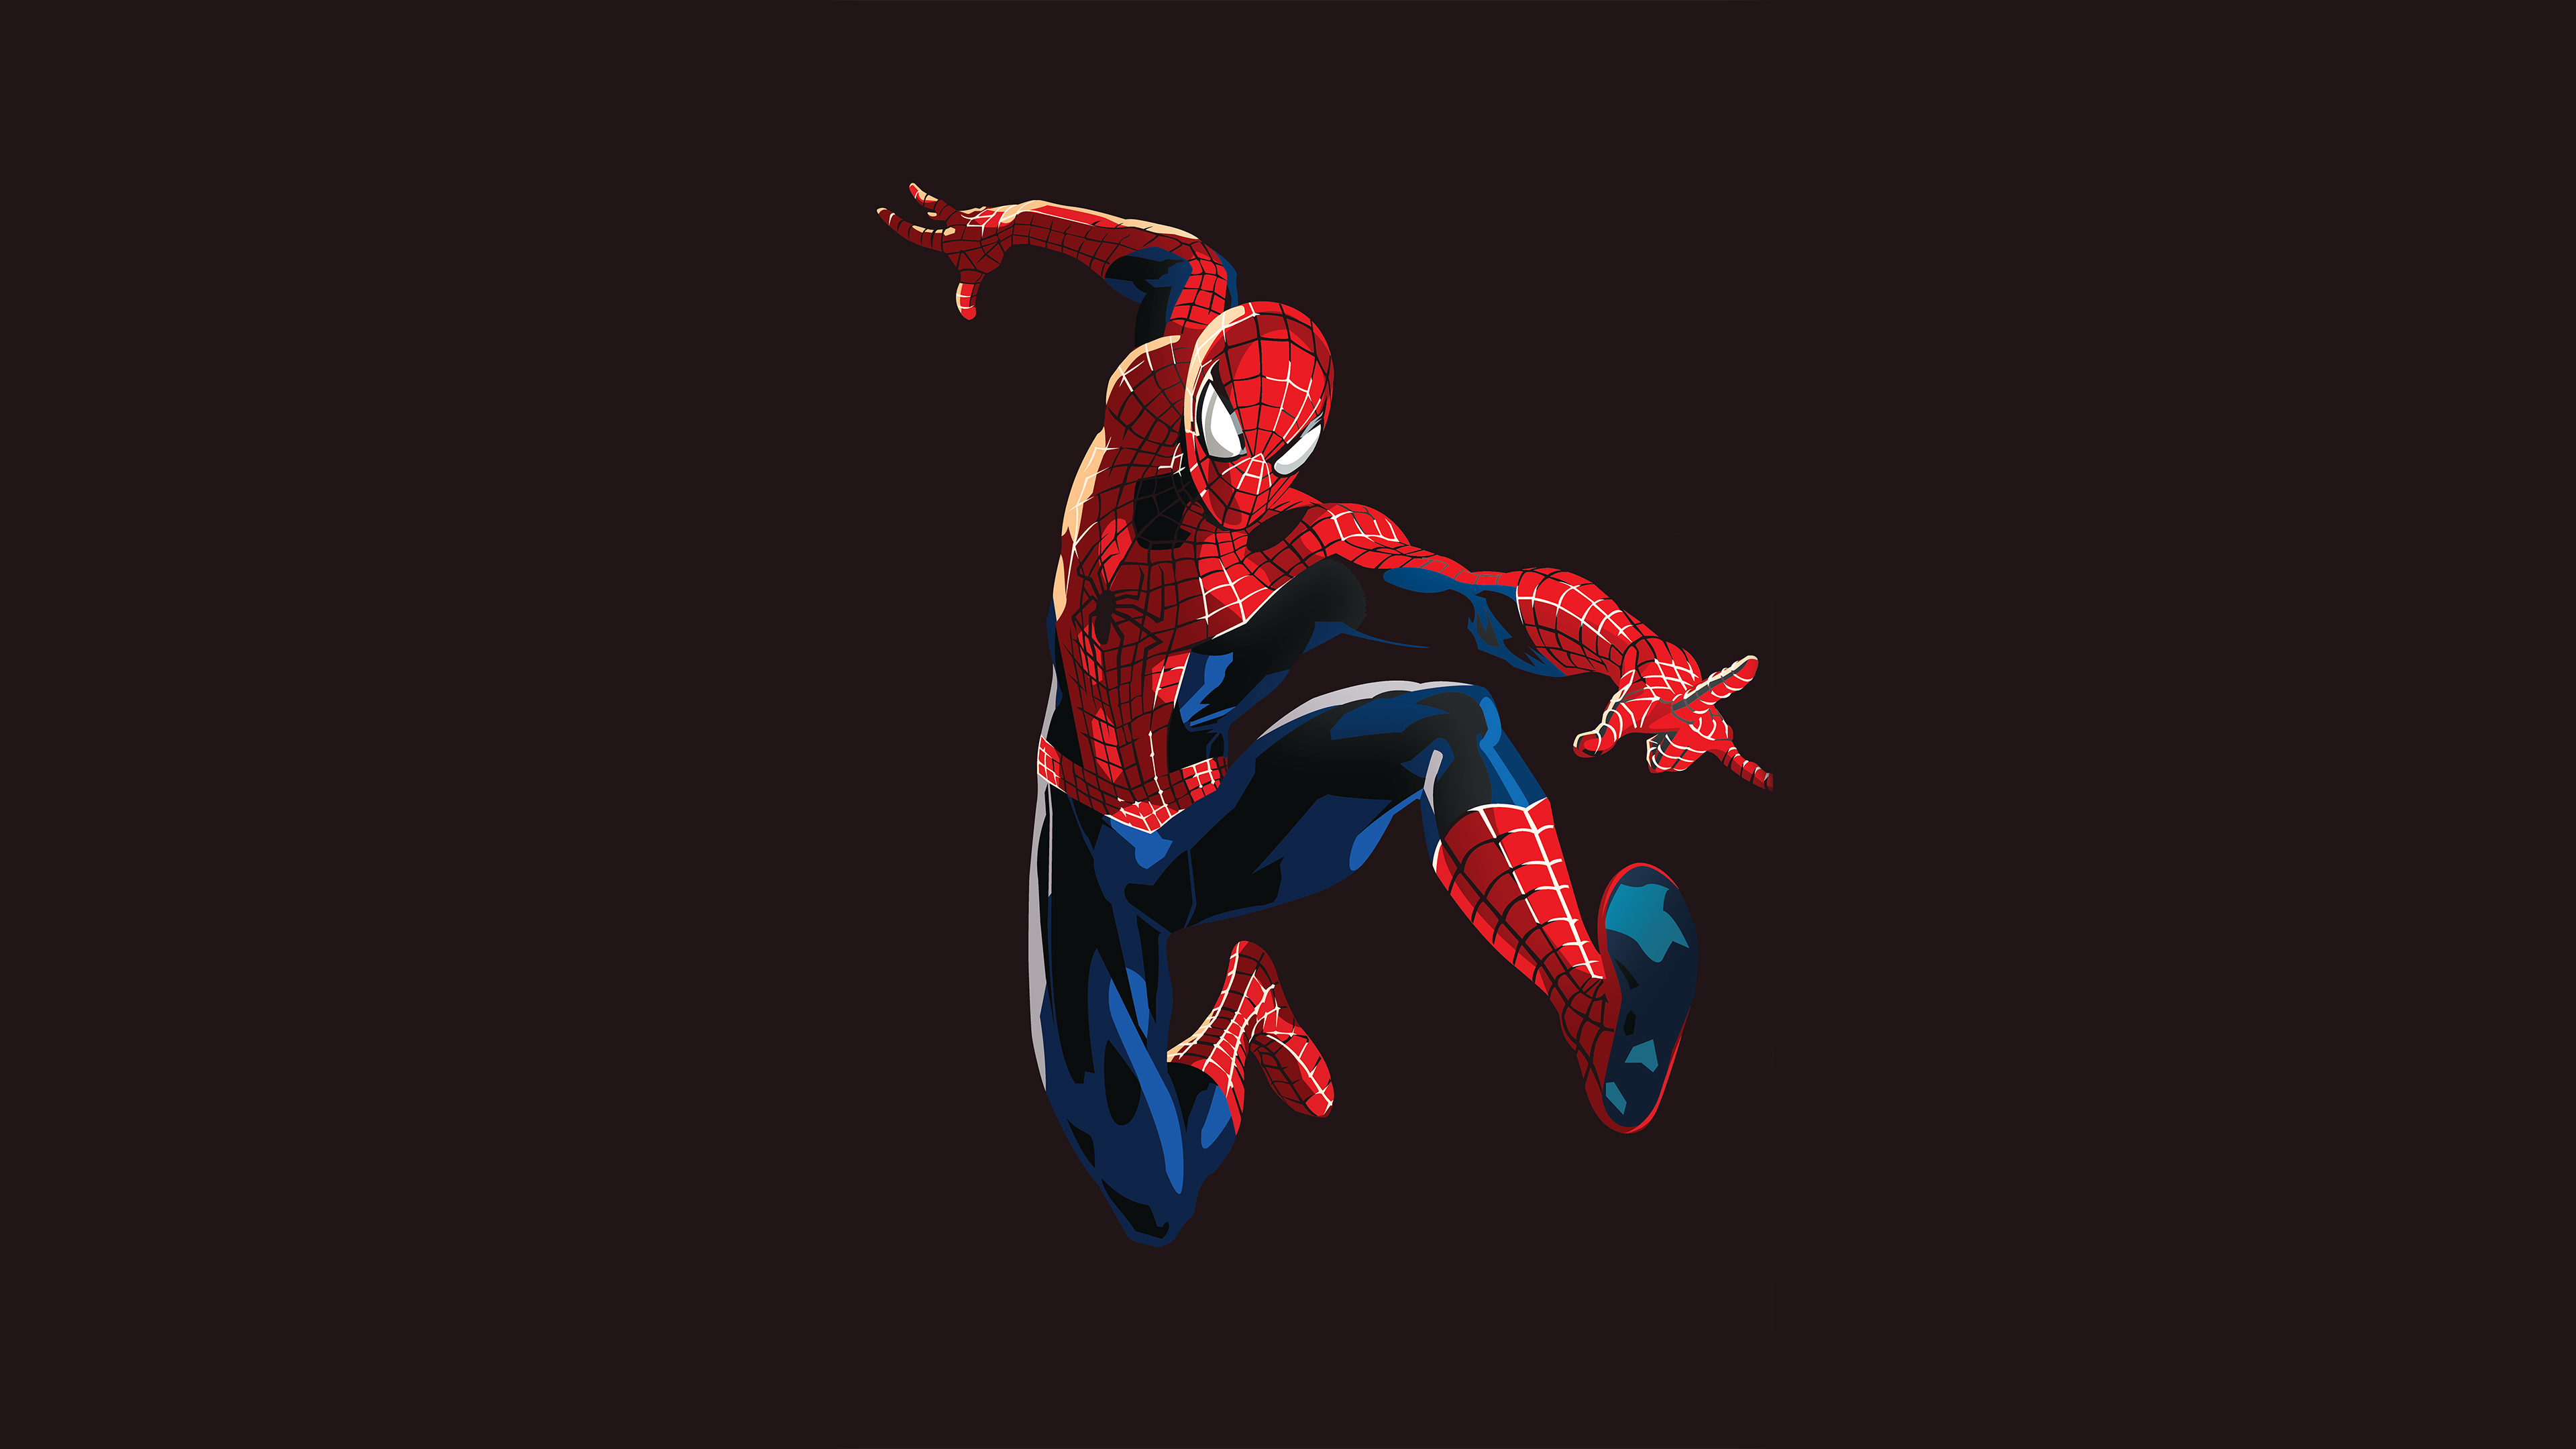 spiderman graphic design 4k 1544286774 - Spiderman Graphic Design 4k - superheroes wallpapers, iron man wallpapers, hd-wallpapers, digital art wallpapers, behance wallpapers, artwork wallpapers, 4k-wallpapers